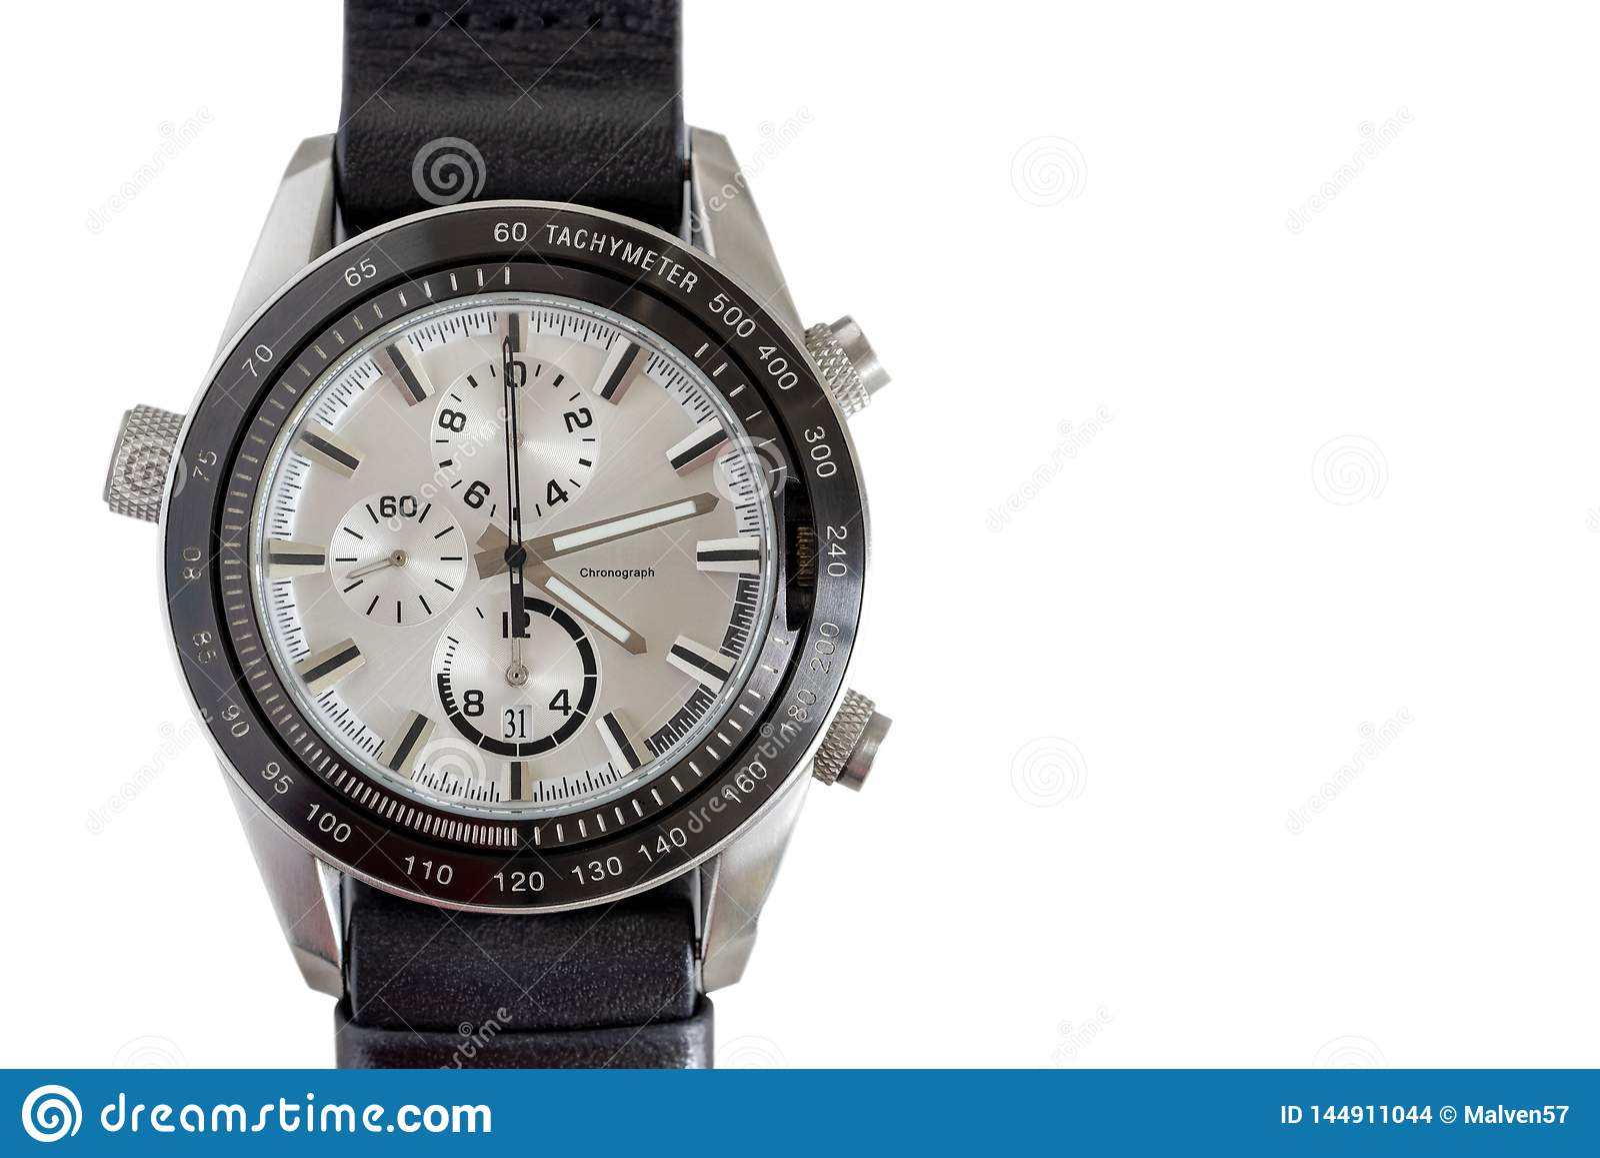 Fashionable wrist watch on a white background